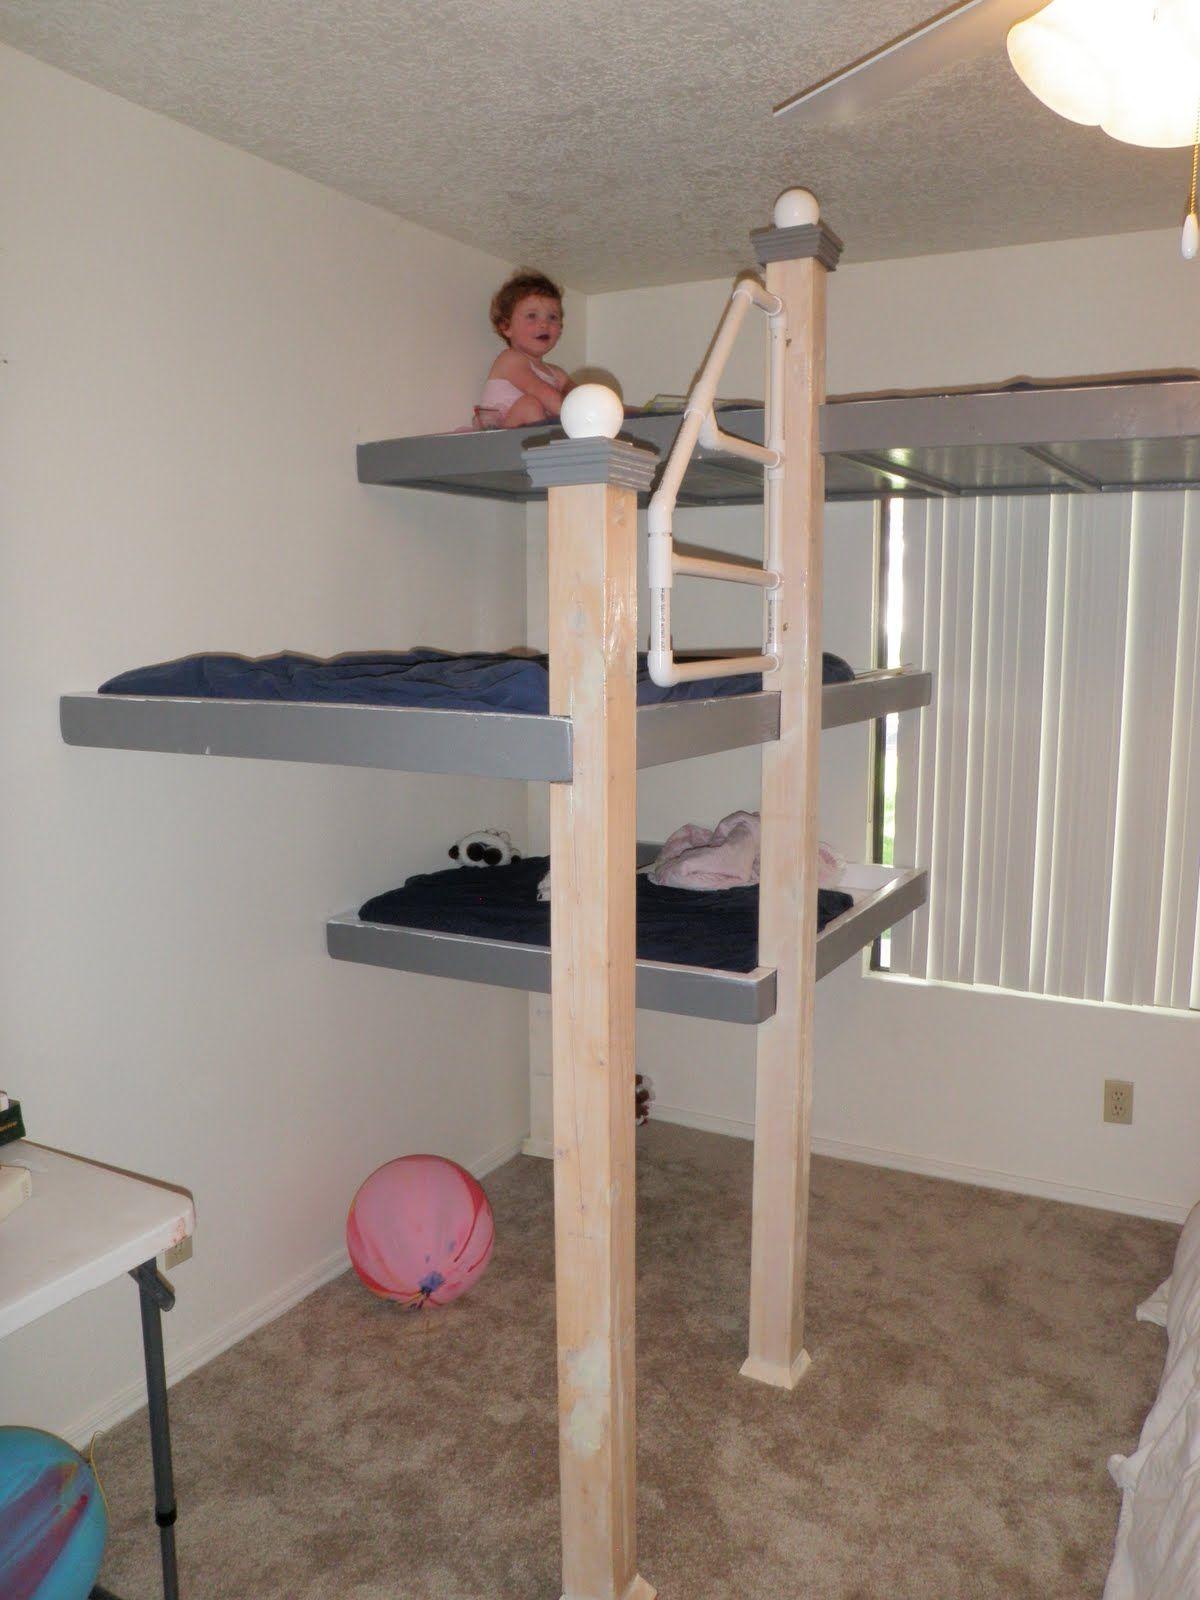 Lit Superposé Marche Escalier coolest bunk beds ever - for more awesome bunk bed ideas